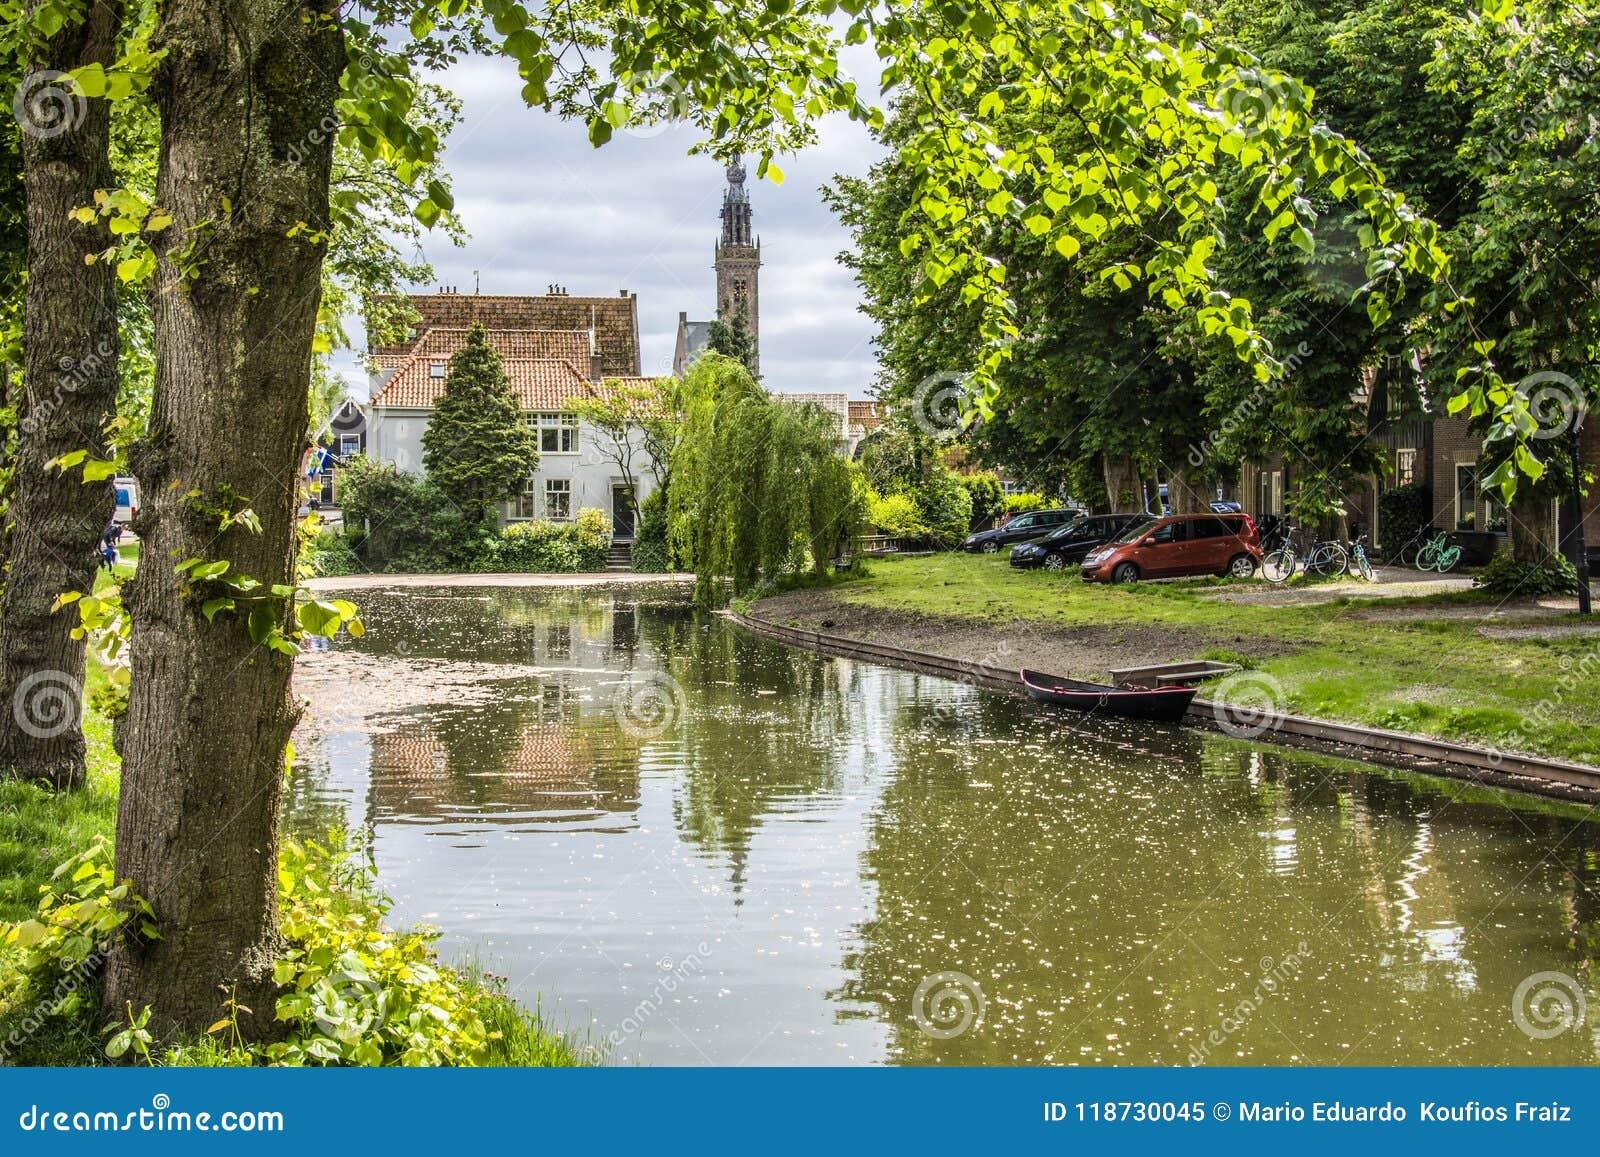 Ландшафт с куполом канала и церков Эдамер Нидерланд